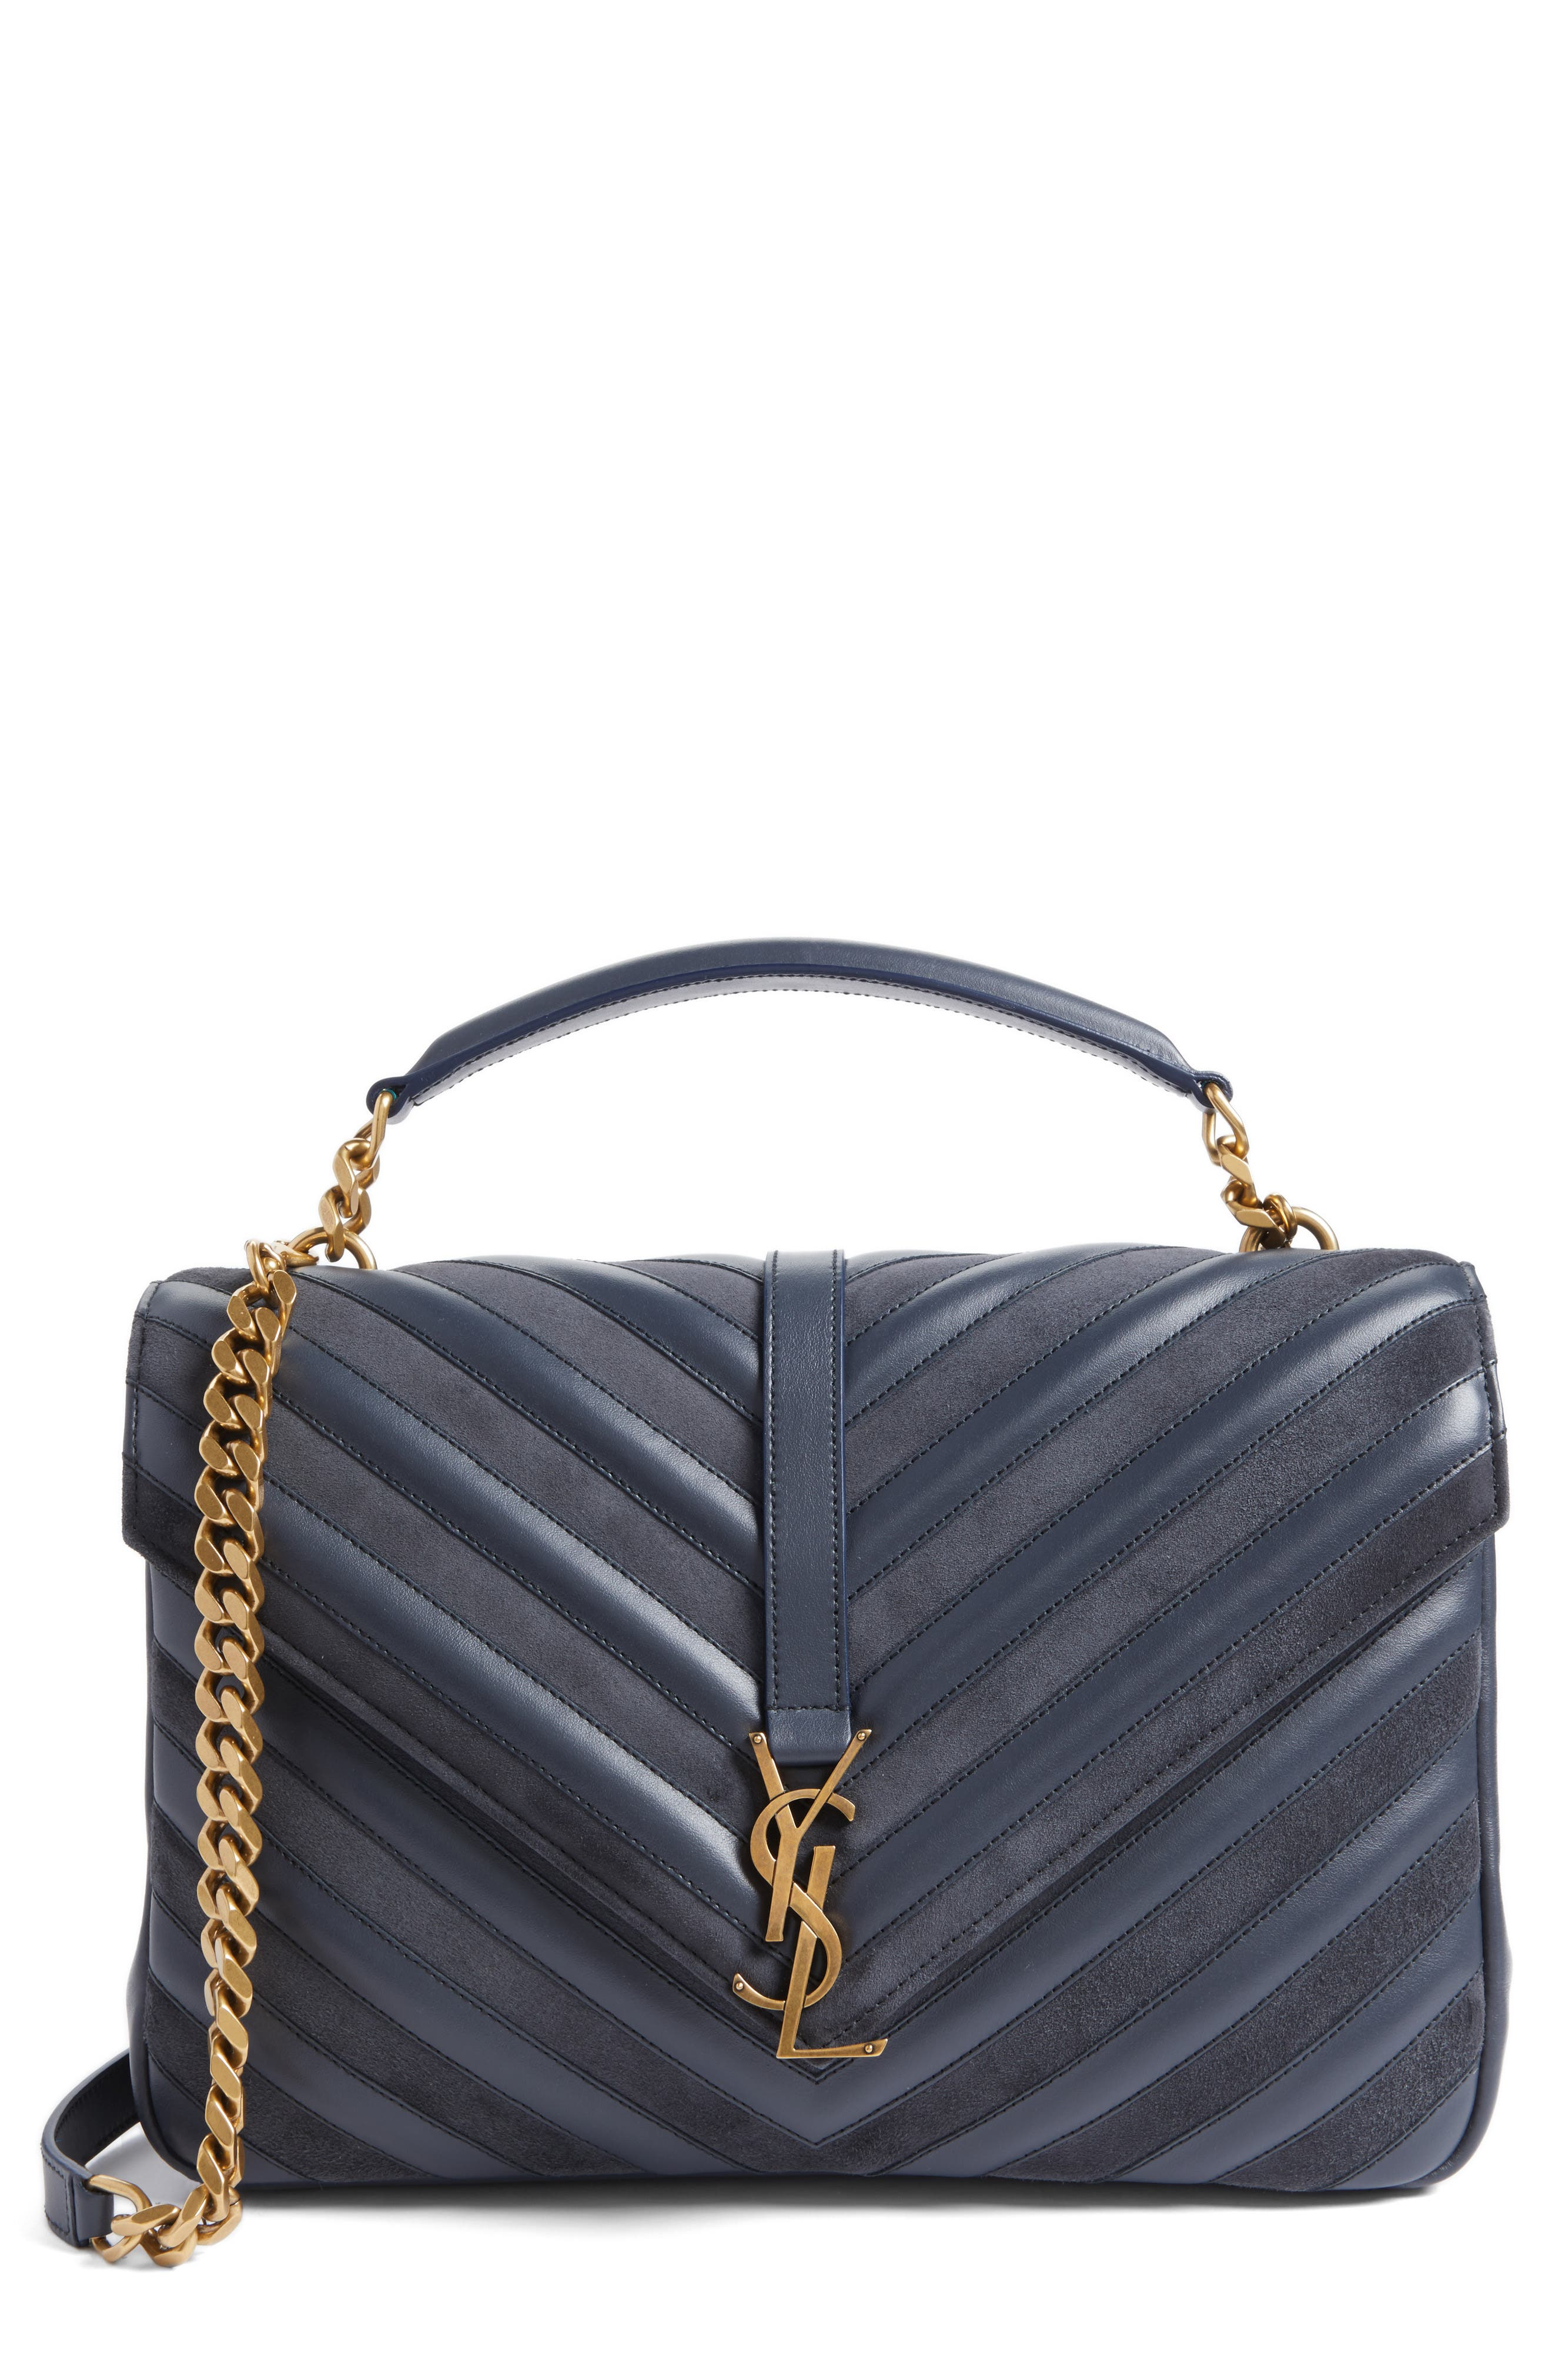 Medium College Patchwork Suede & Leather Shoulder Bag,                         Main,                         color, Graphite